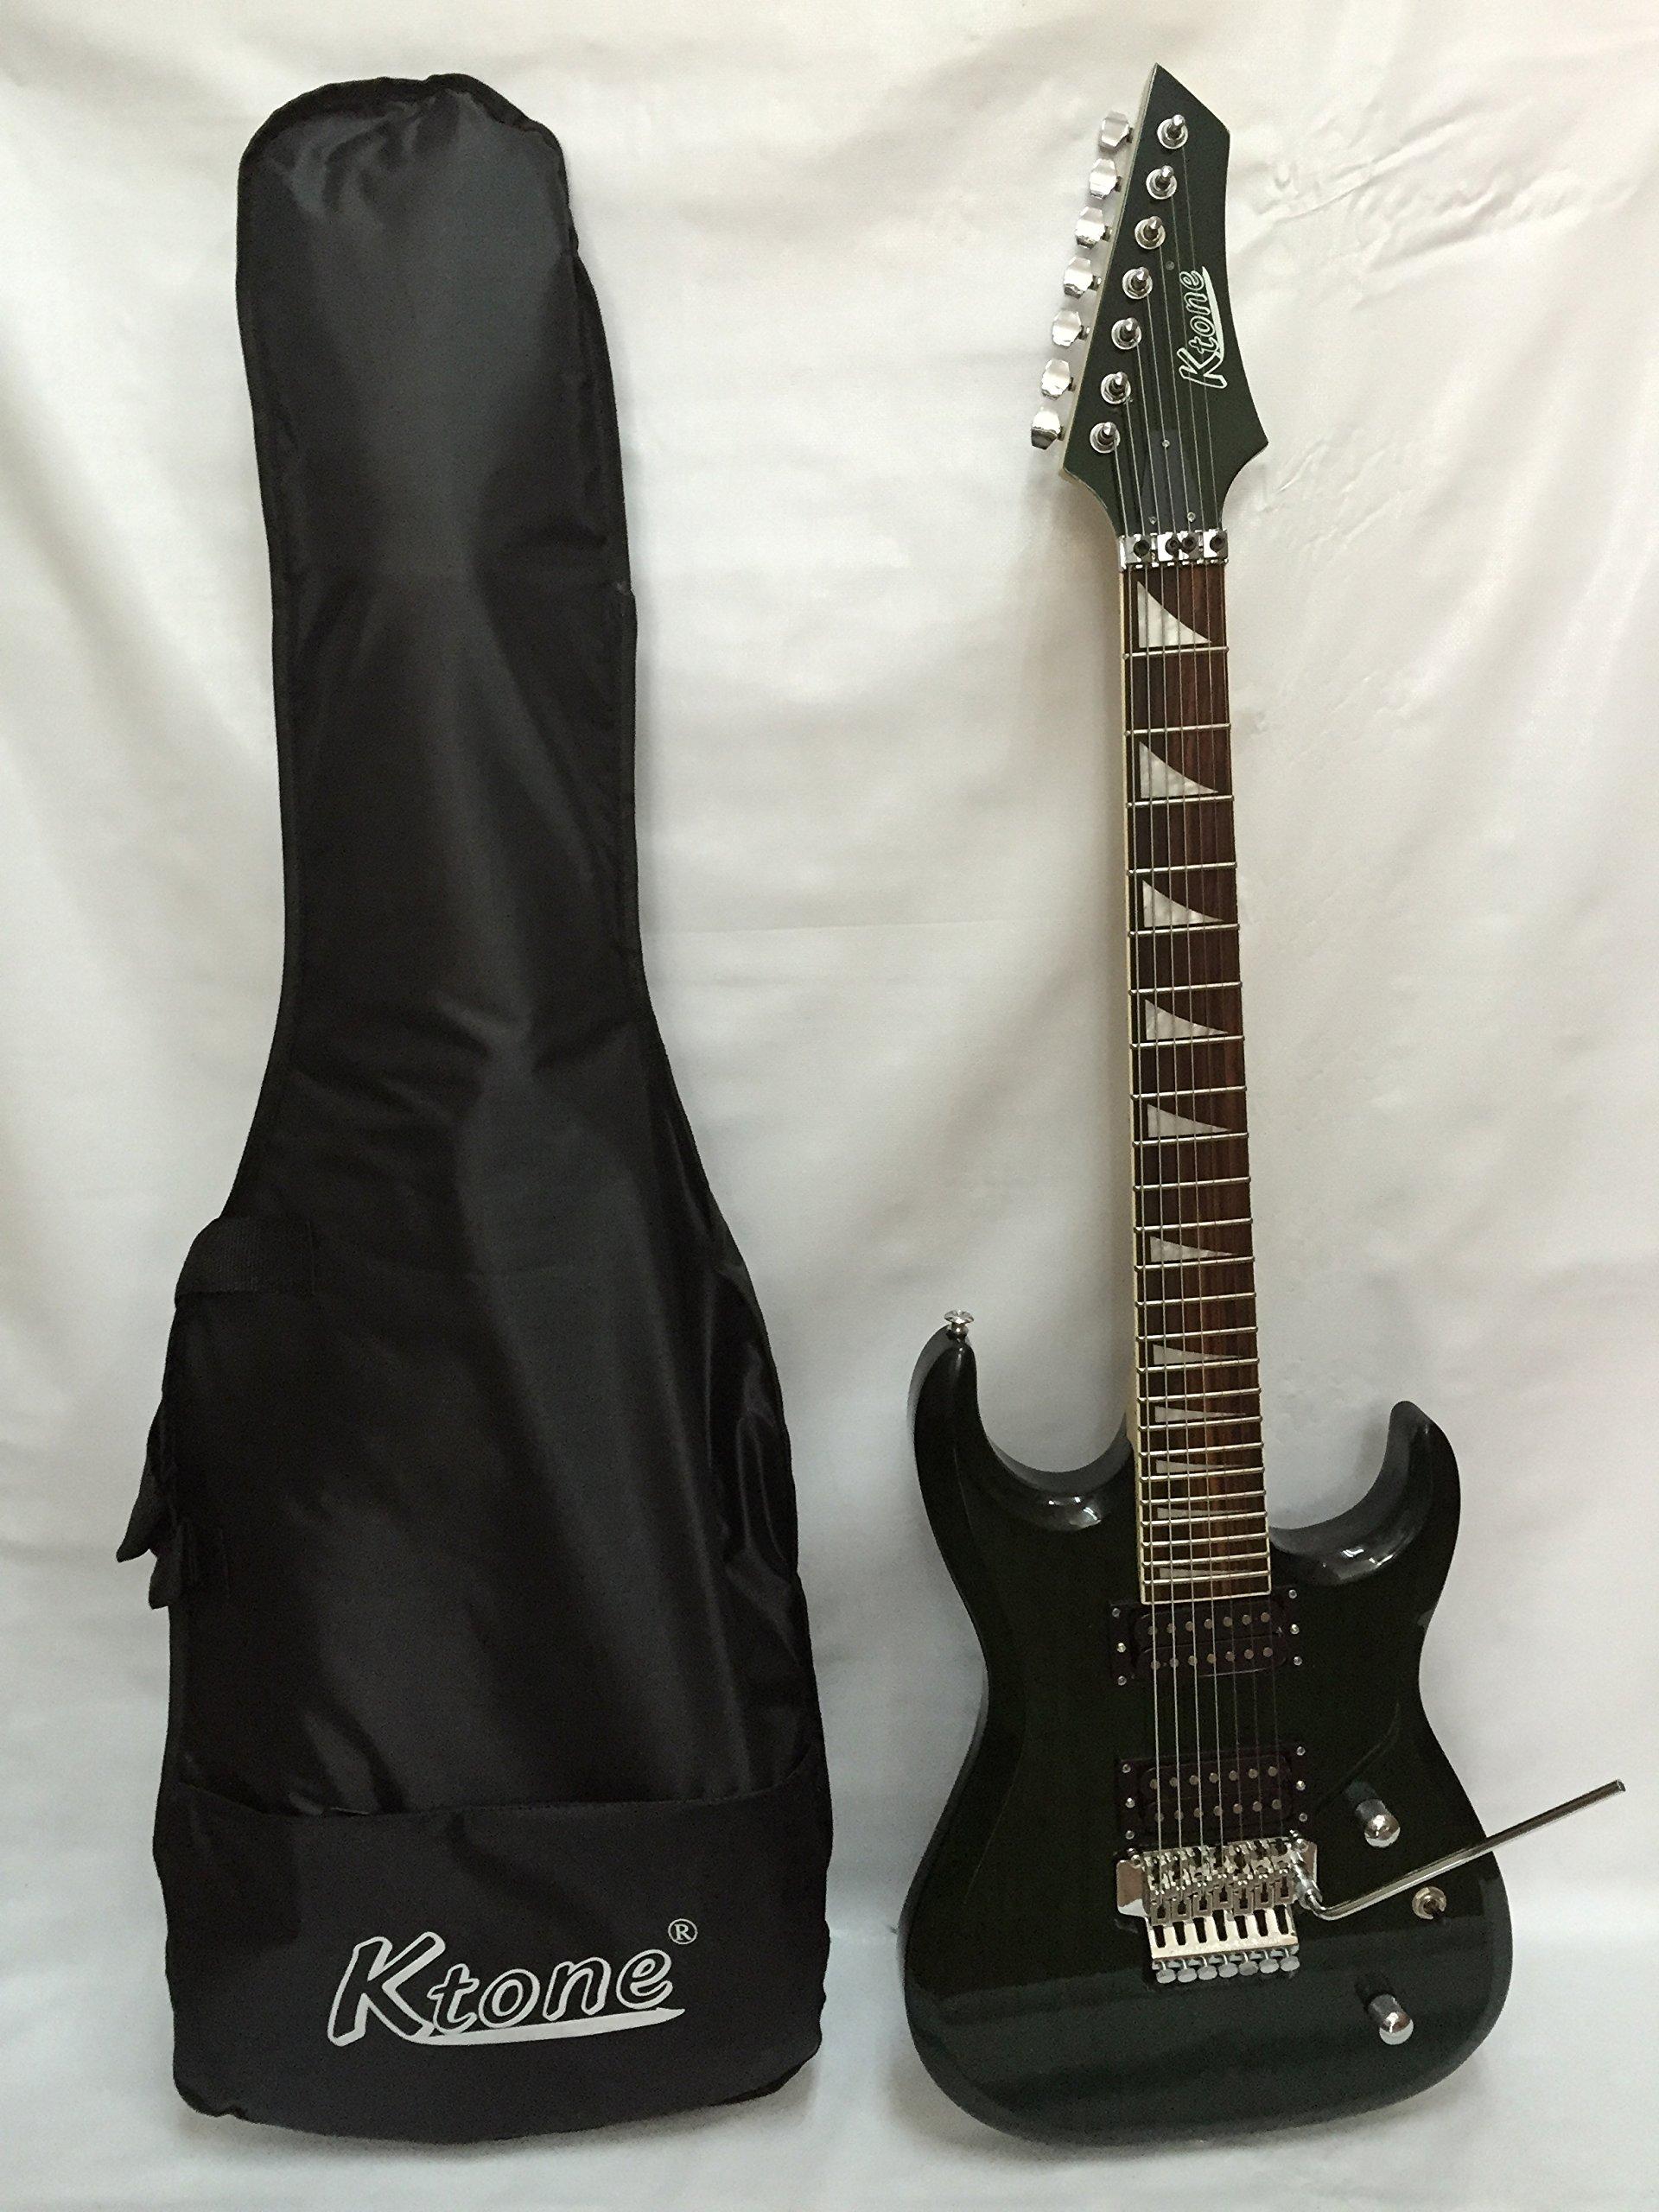 Cheap Tg Green 7 String Electric Guitar Free Gig Bag Black Friday & Cyber Monday 2019